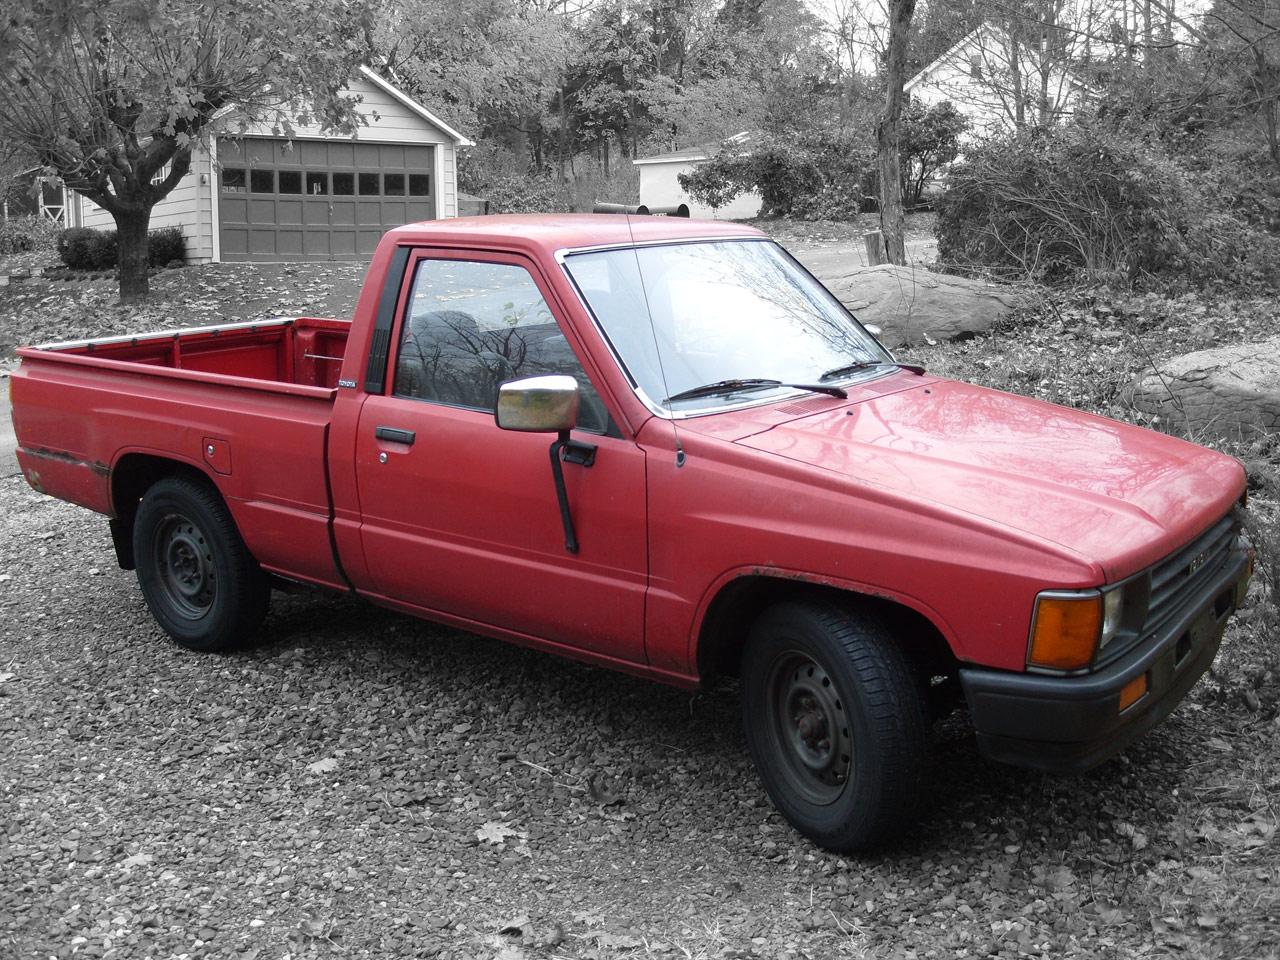 red toyota pickup truck. Black Bedroom Furniture Sets. Home Design Ideas